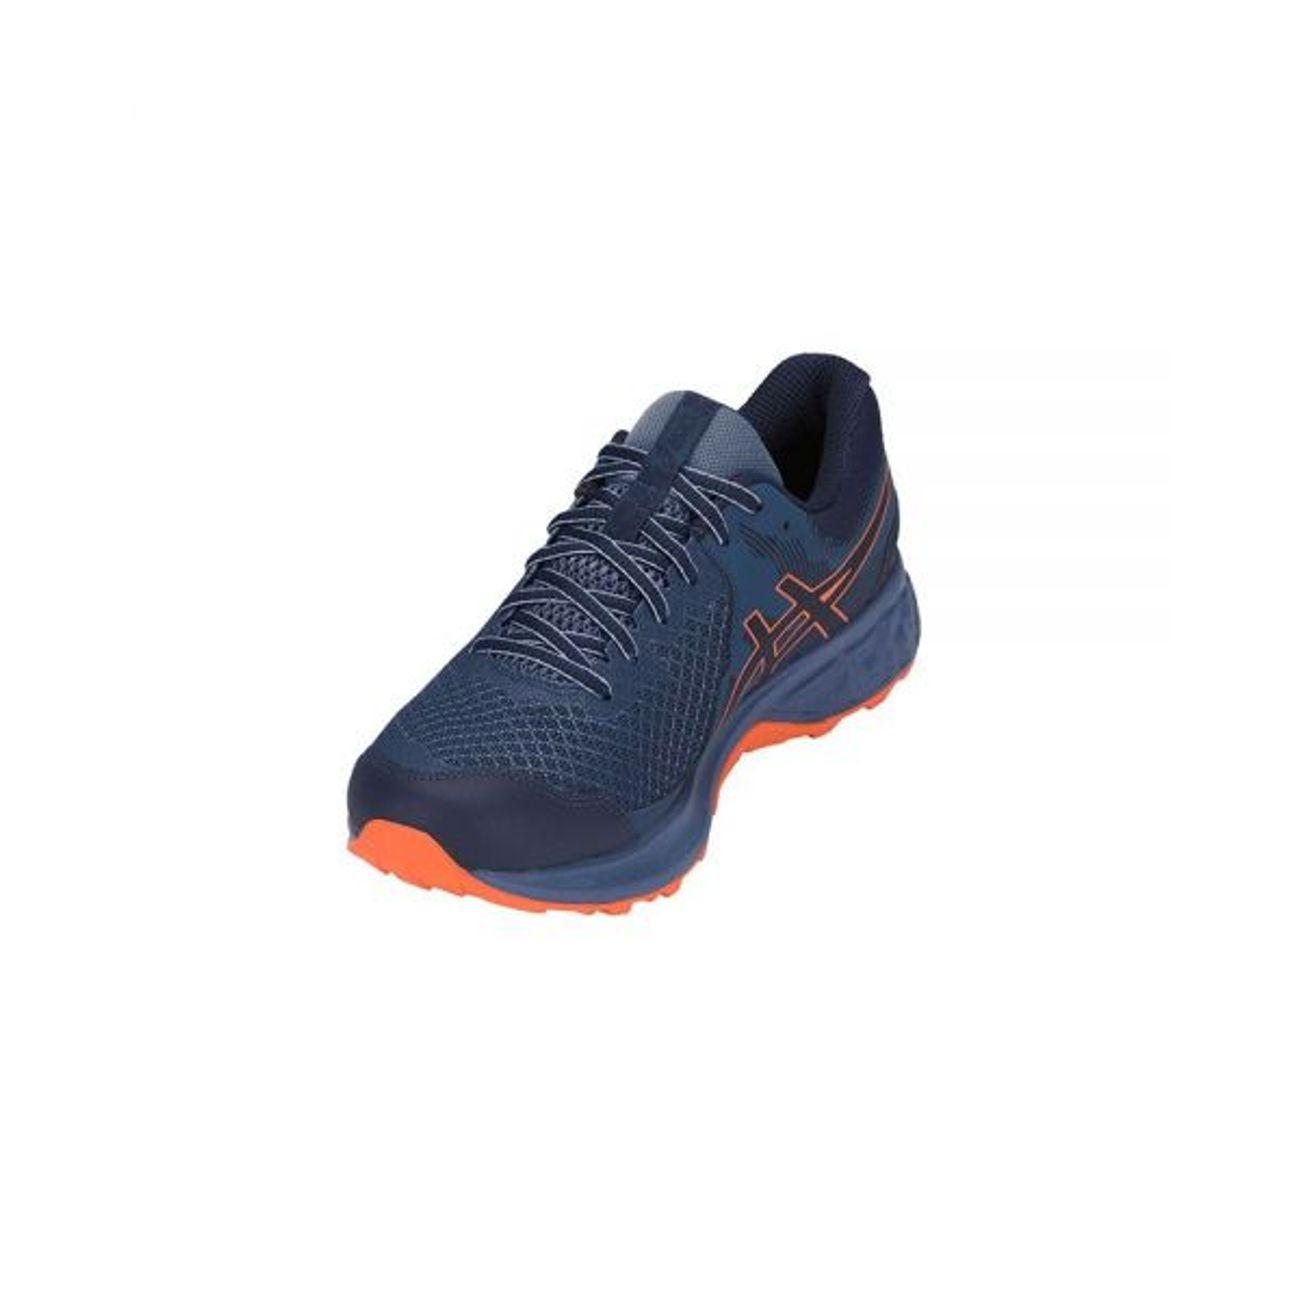 À Chaussures Course Gel sonoma Homme Asics 4 Pied 5jL34RA